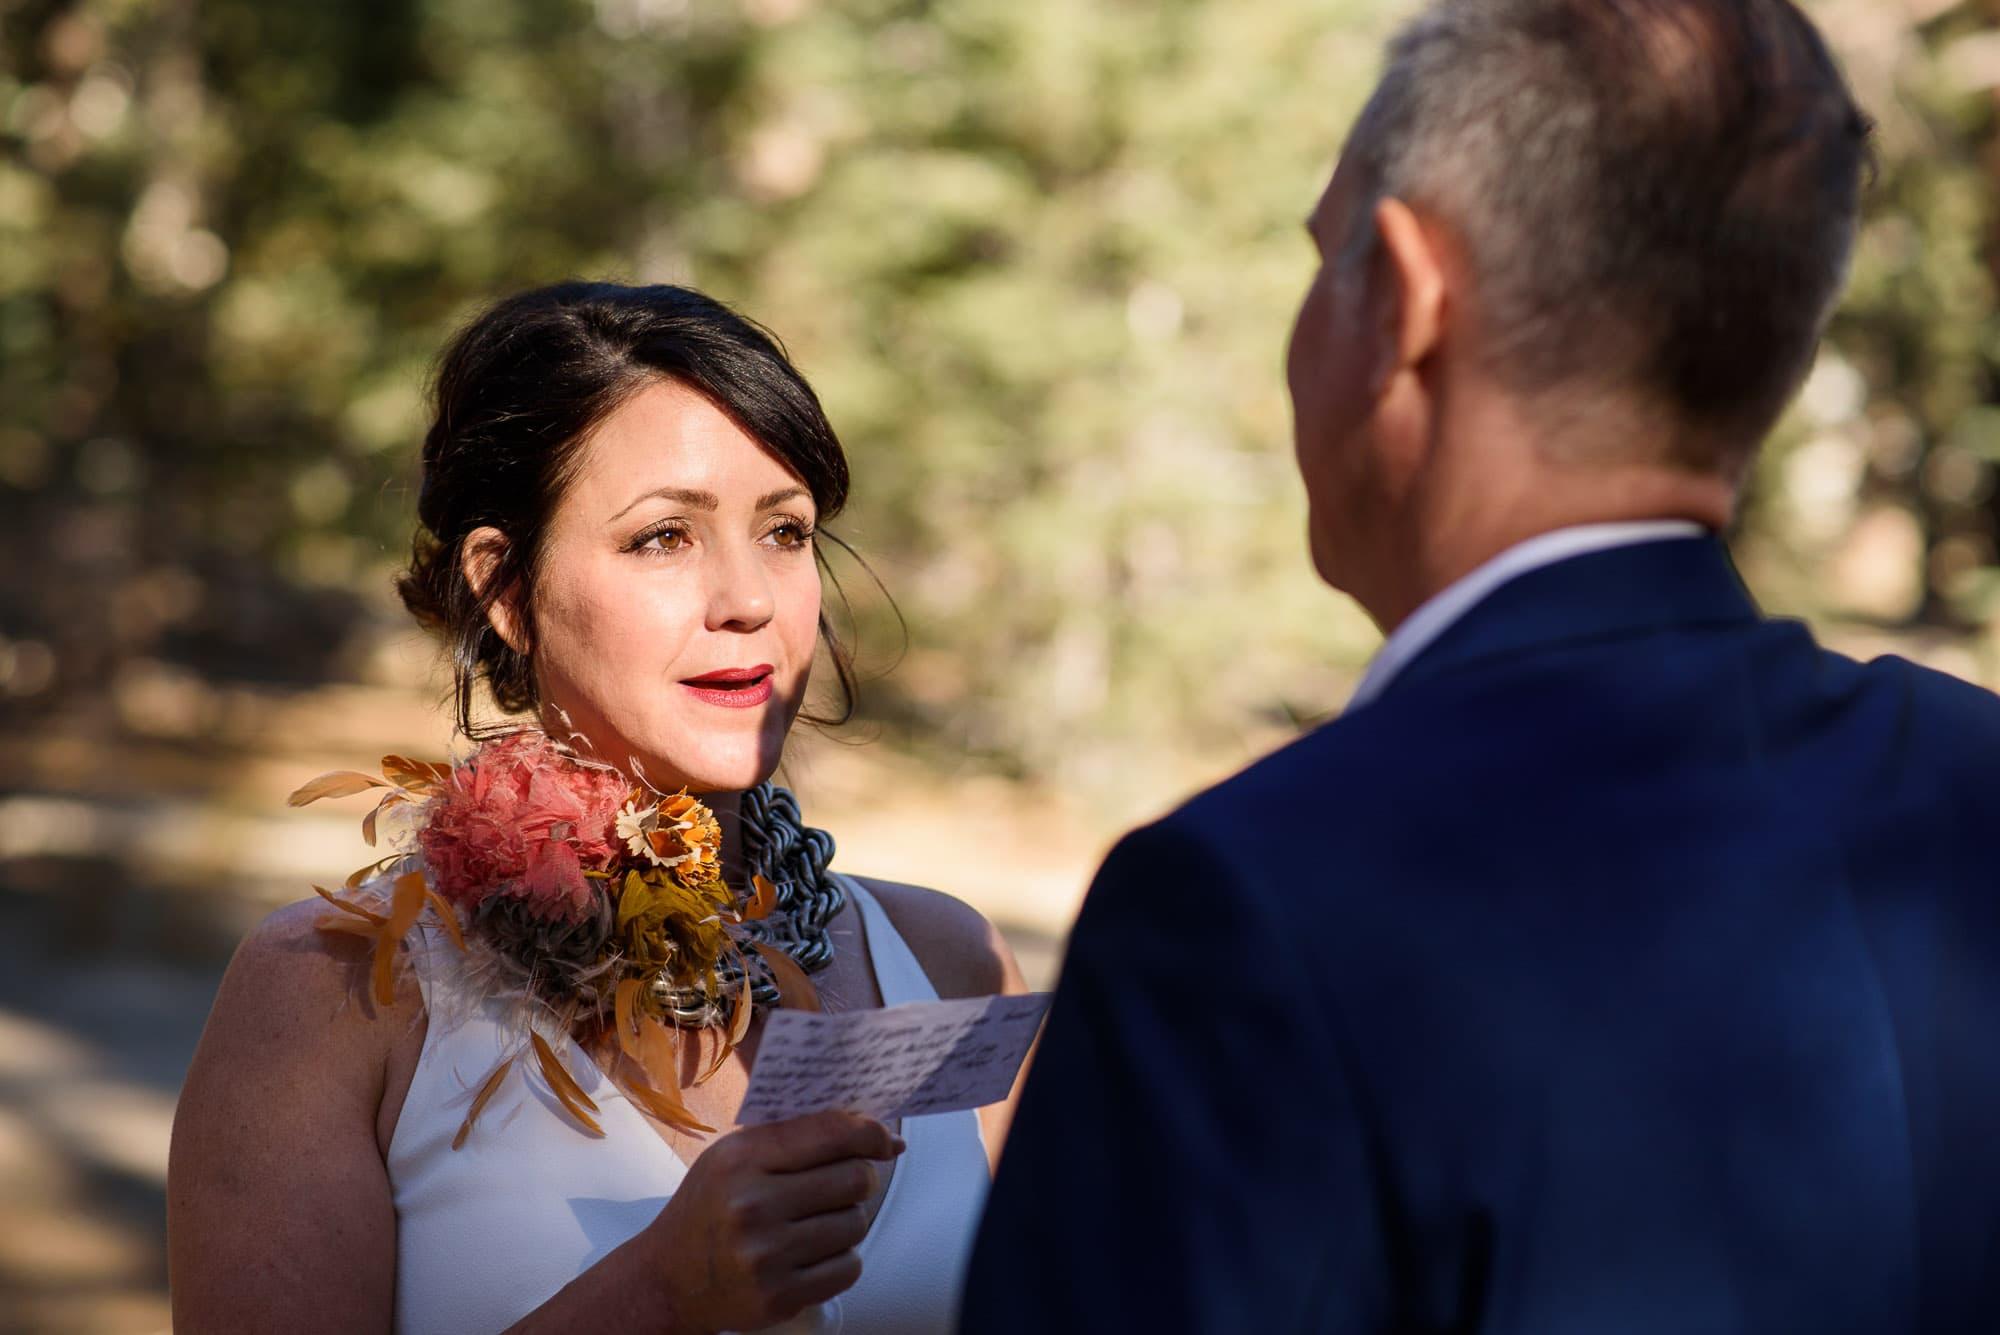 018_Alan_and_Heidi_Palm_Springs_Tram_Wedding